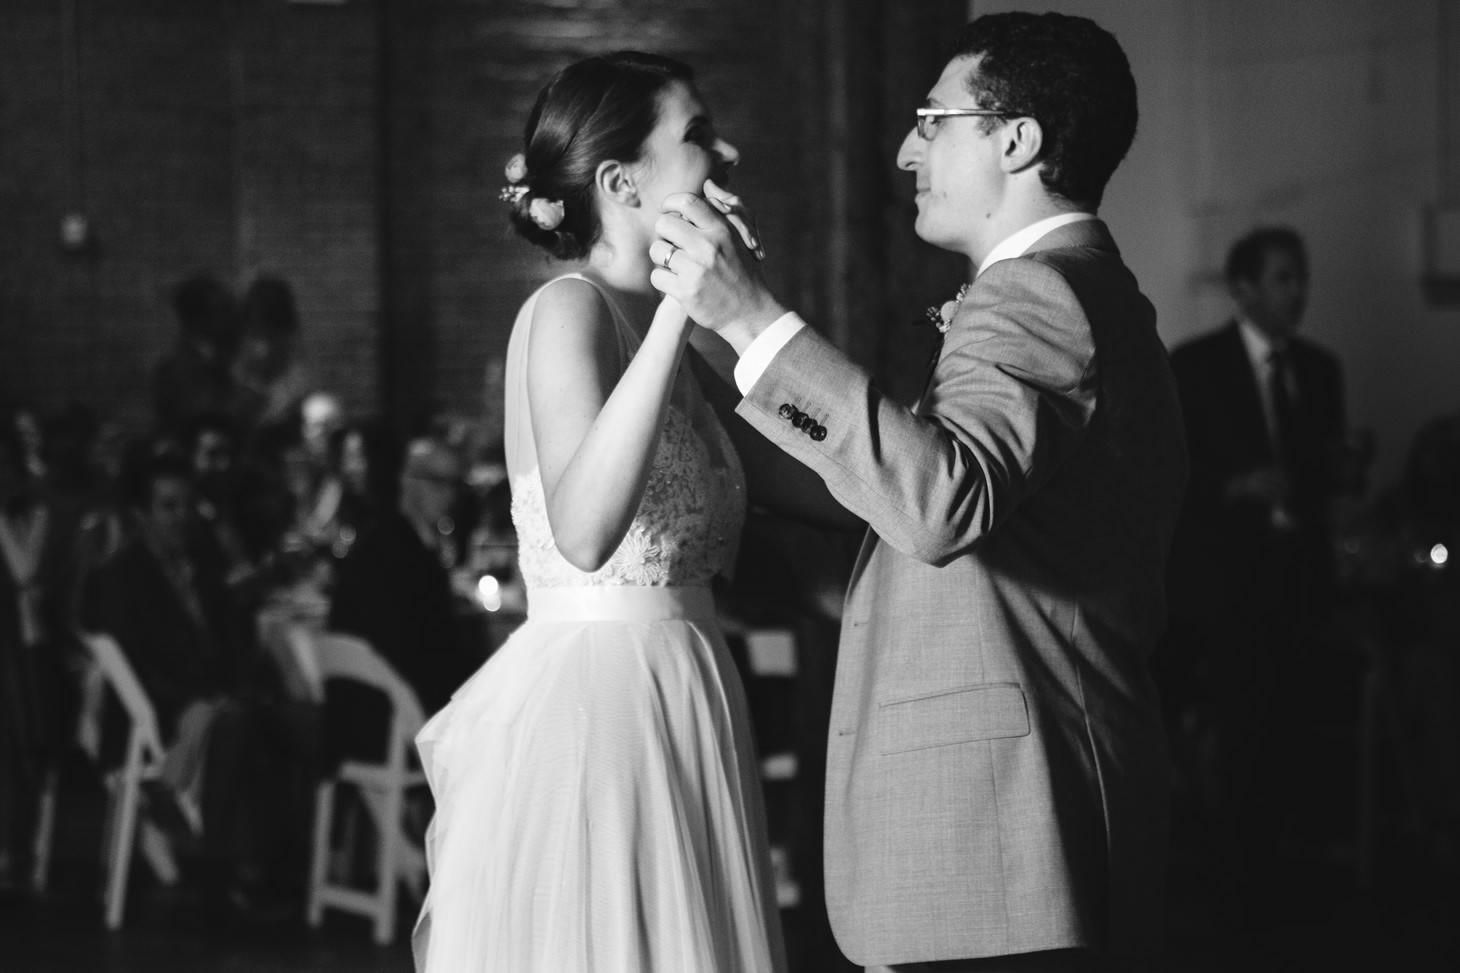 033-nyc-dumbo-loft-brooklyn-wedding-photographer-smitten-chickens-photo-.jpg